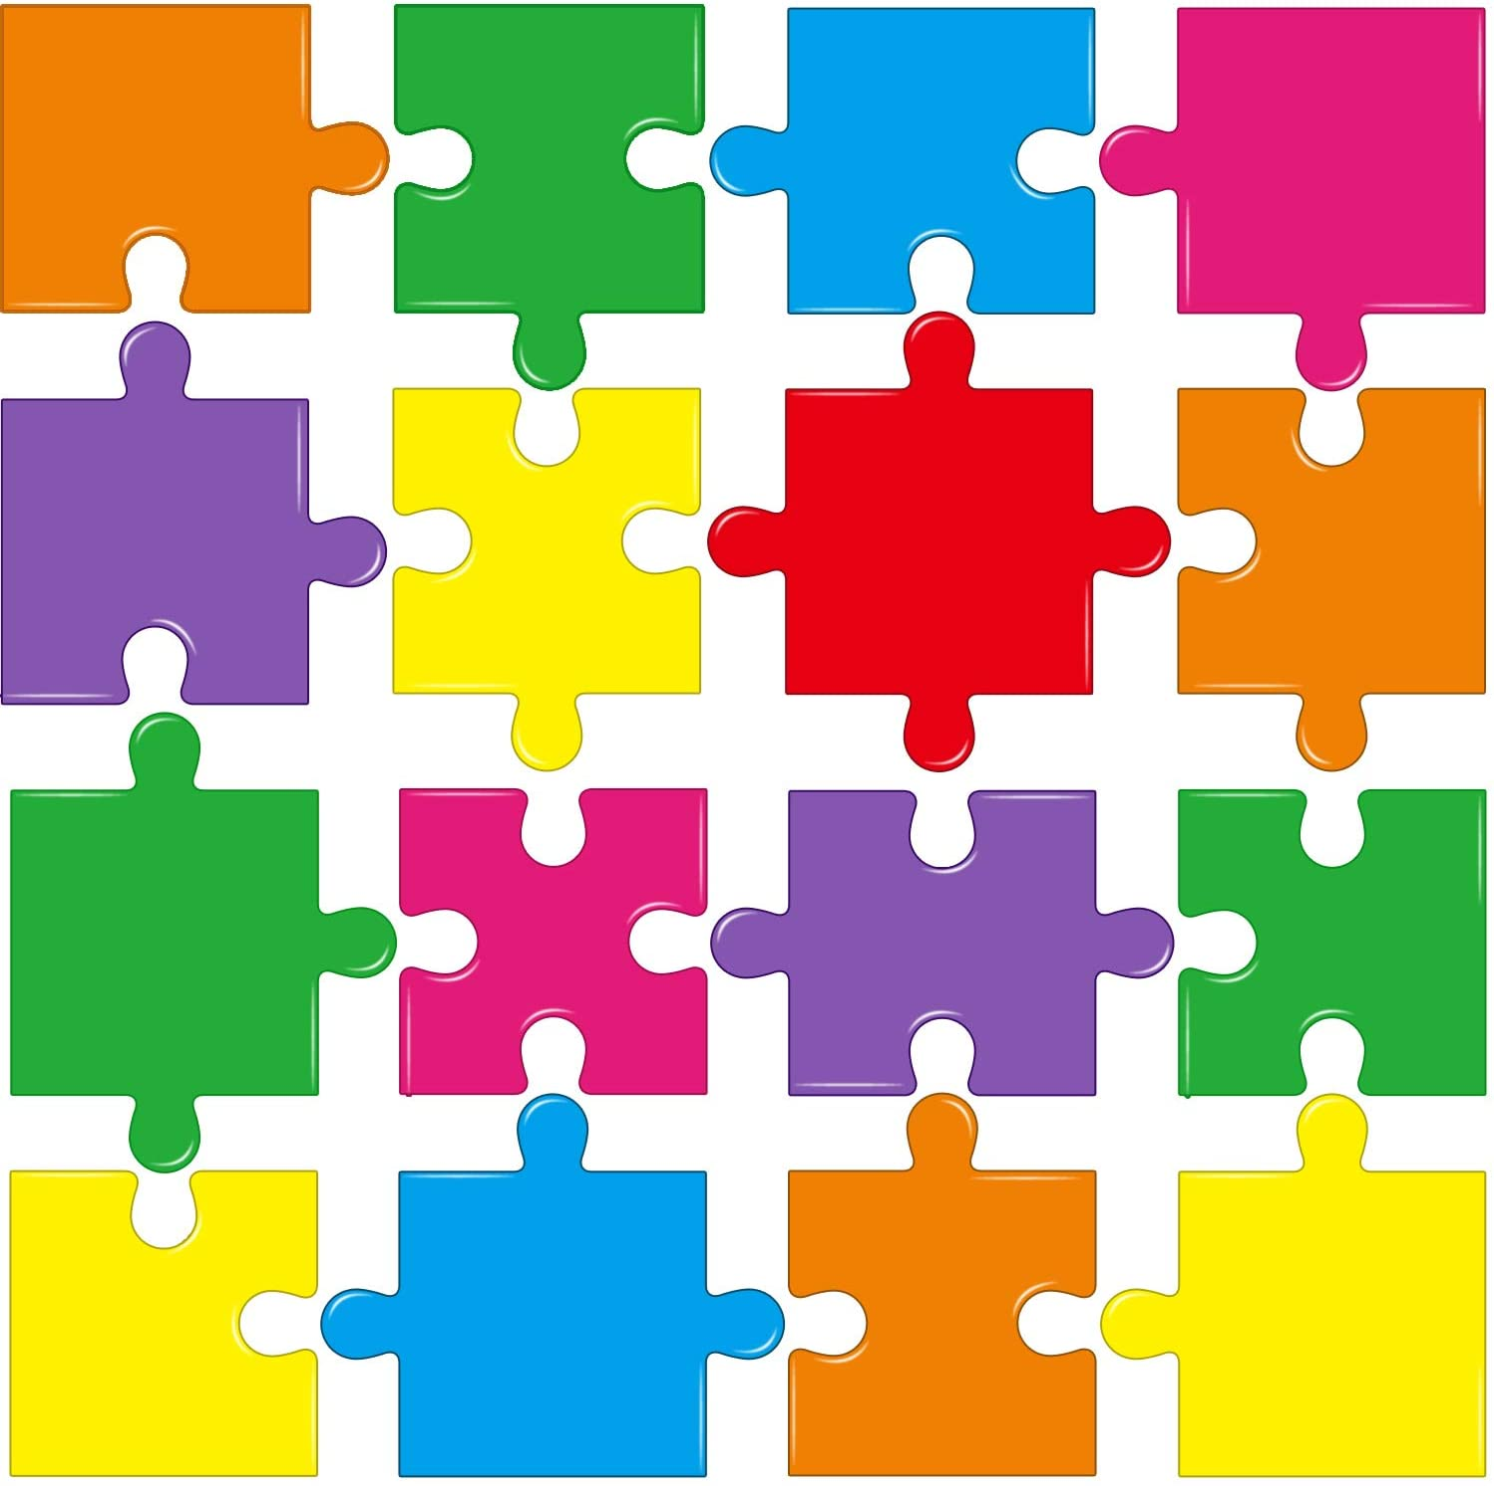 64 Pieces Puzzle Pieces Cutouts Puzzle Pieces Accents Paper for Classroom Decor Bulletin Board School Playroom Baby Nursery Kids Bedroom Art Studio